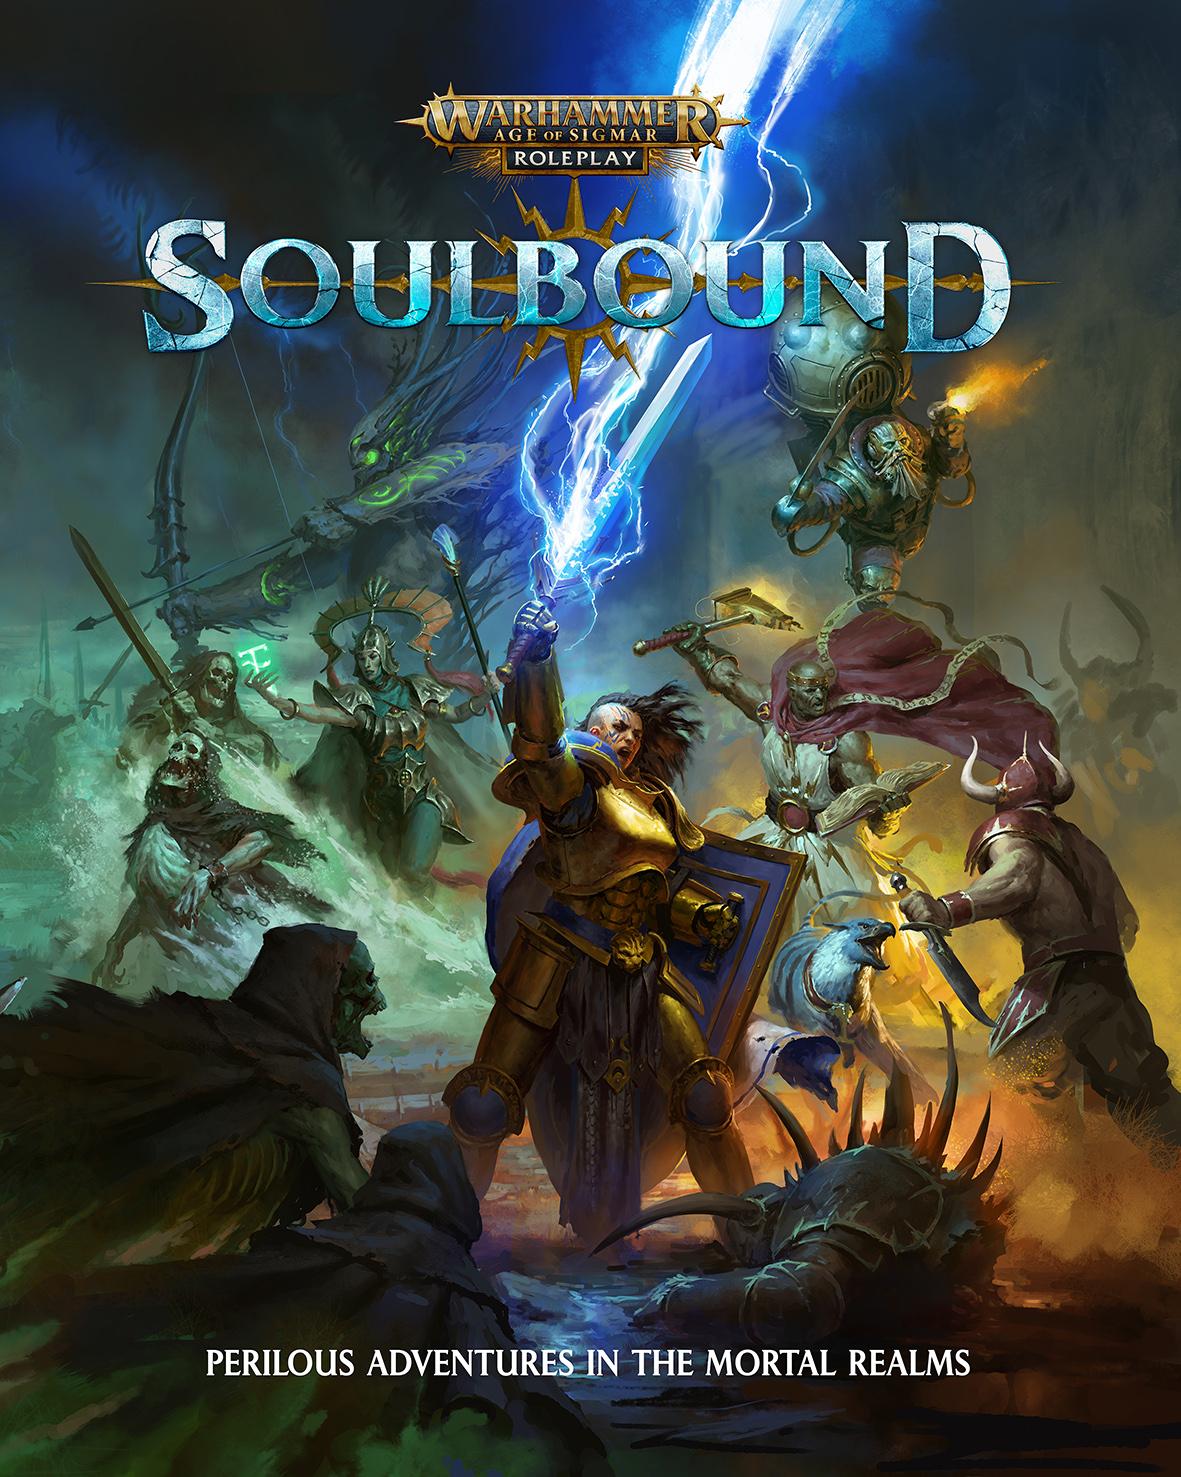 Warhammer Age of Sigmar: Soulbound